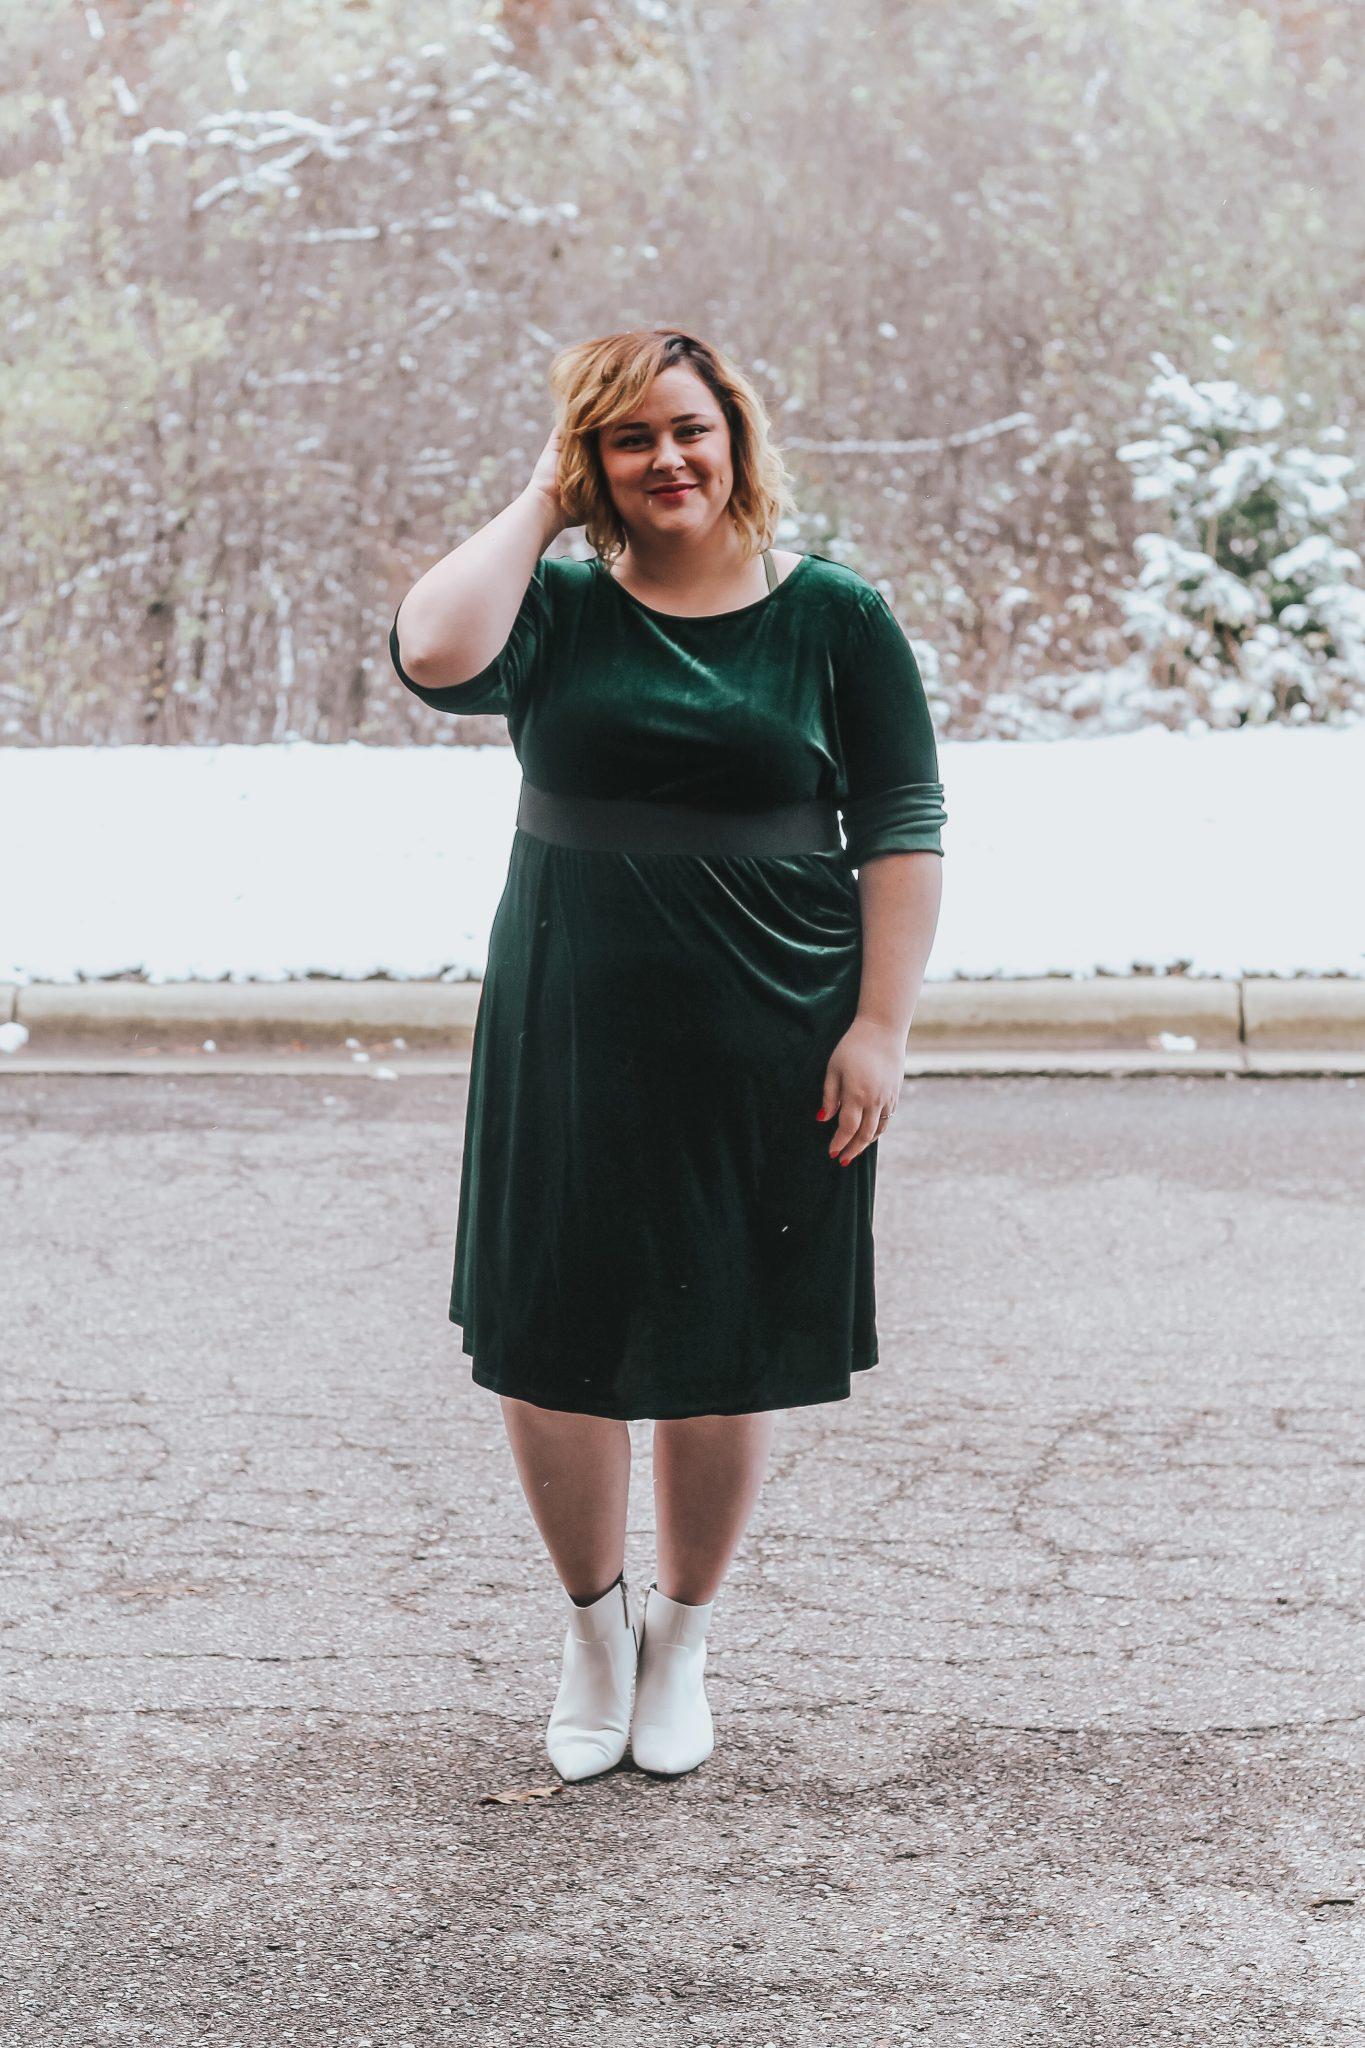 Holiday Dresses at Avon